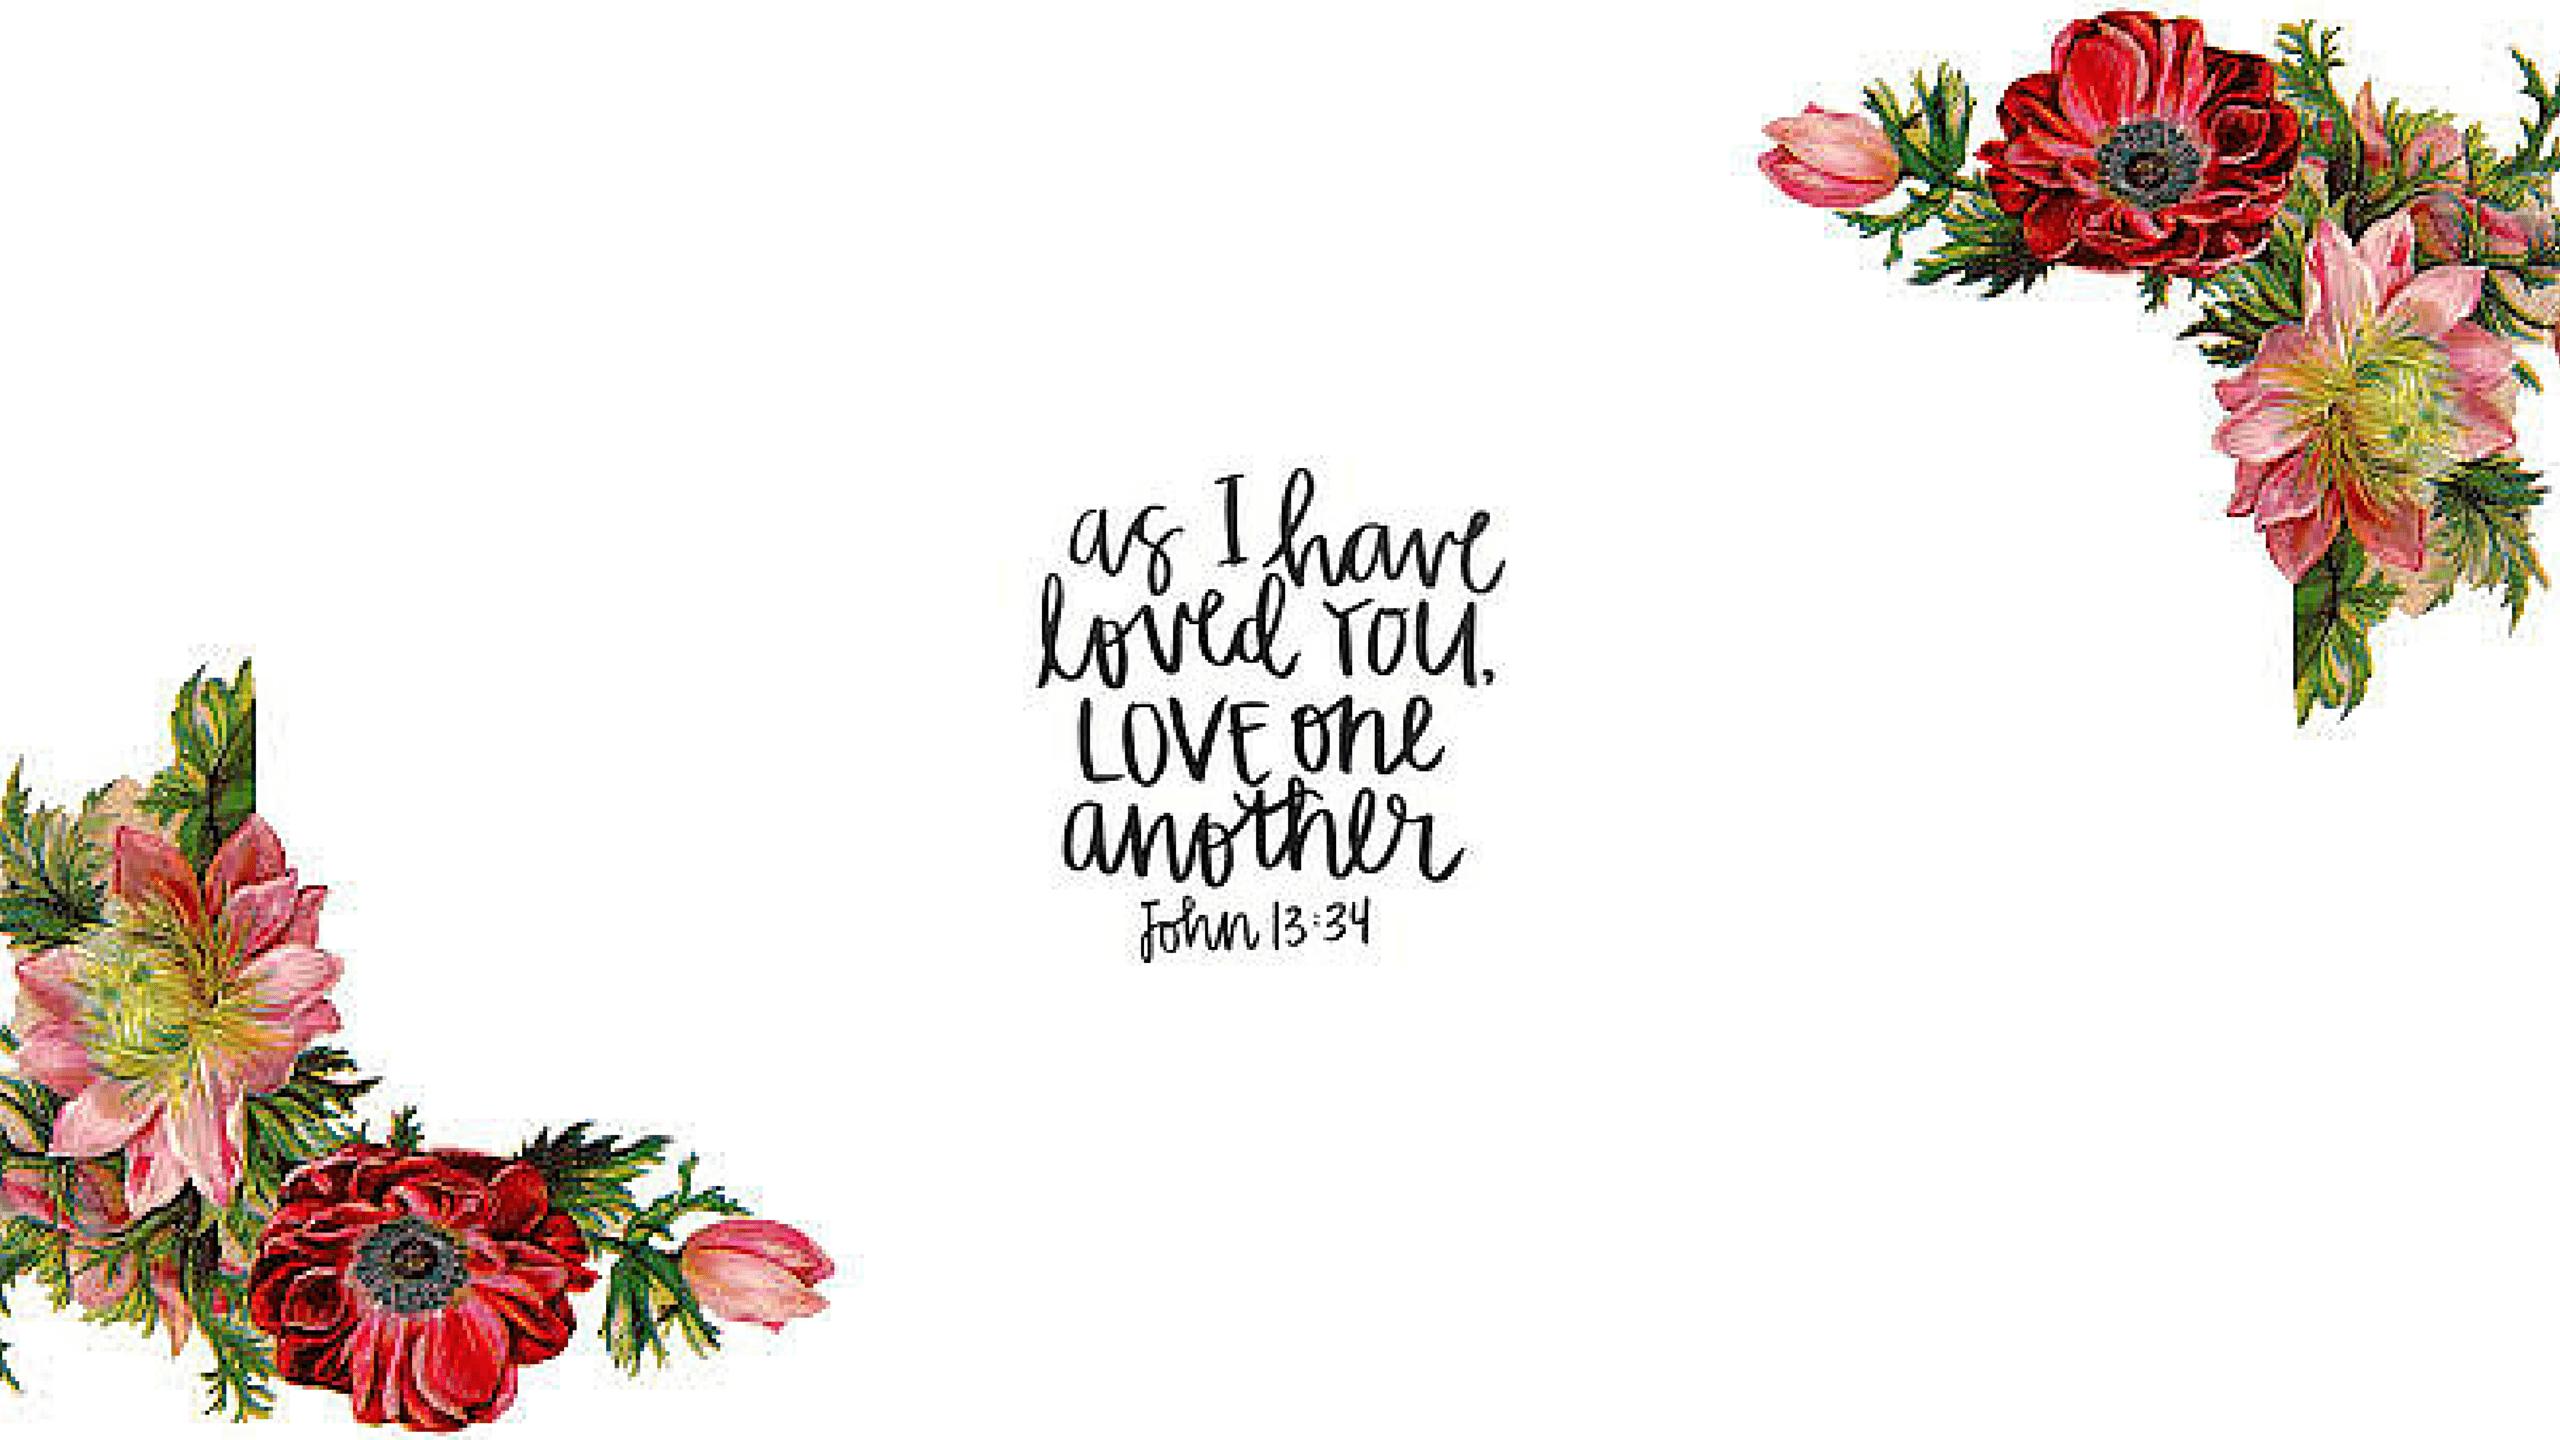 Bible Verses Wallpaper Desktop Posted By Sarah Walker